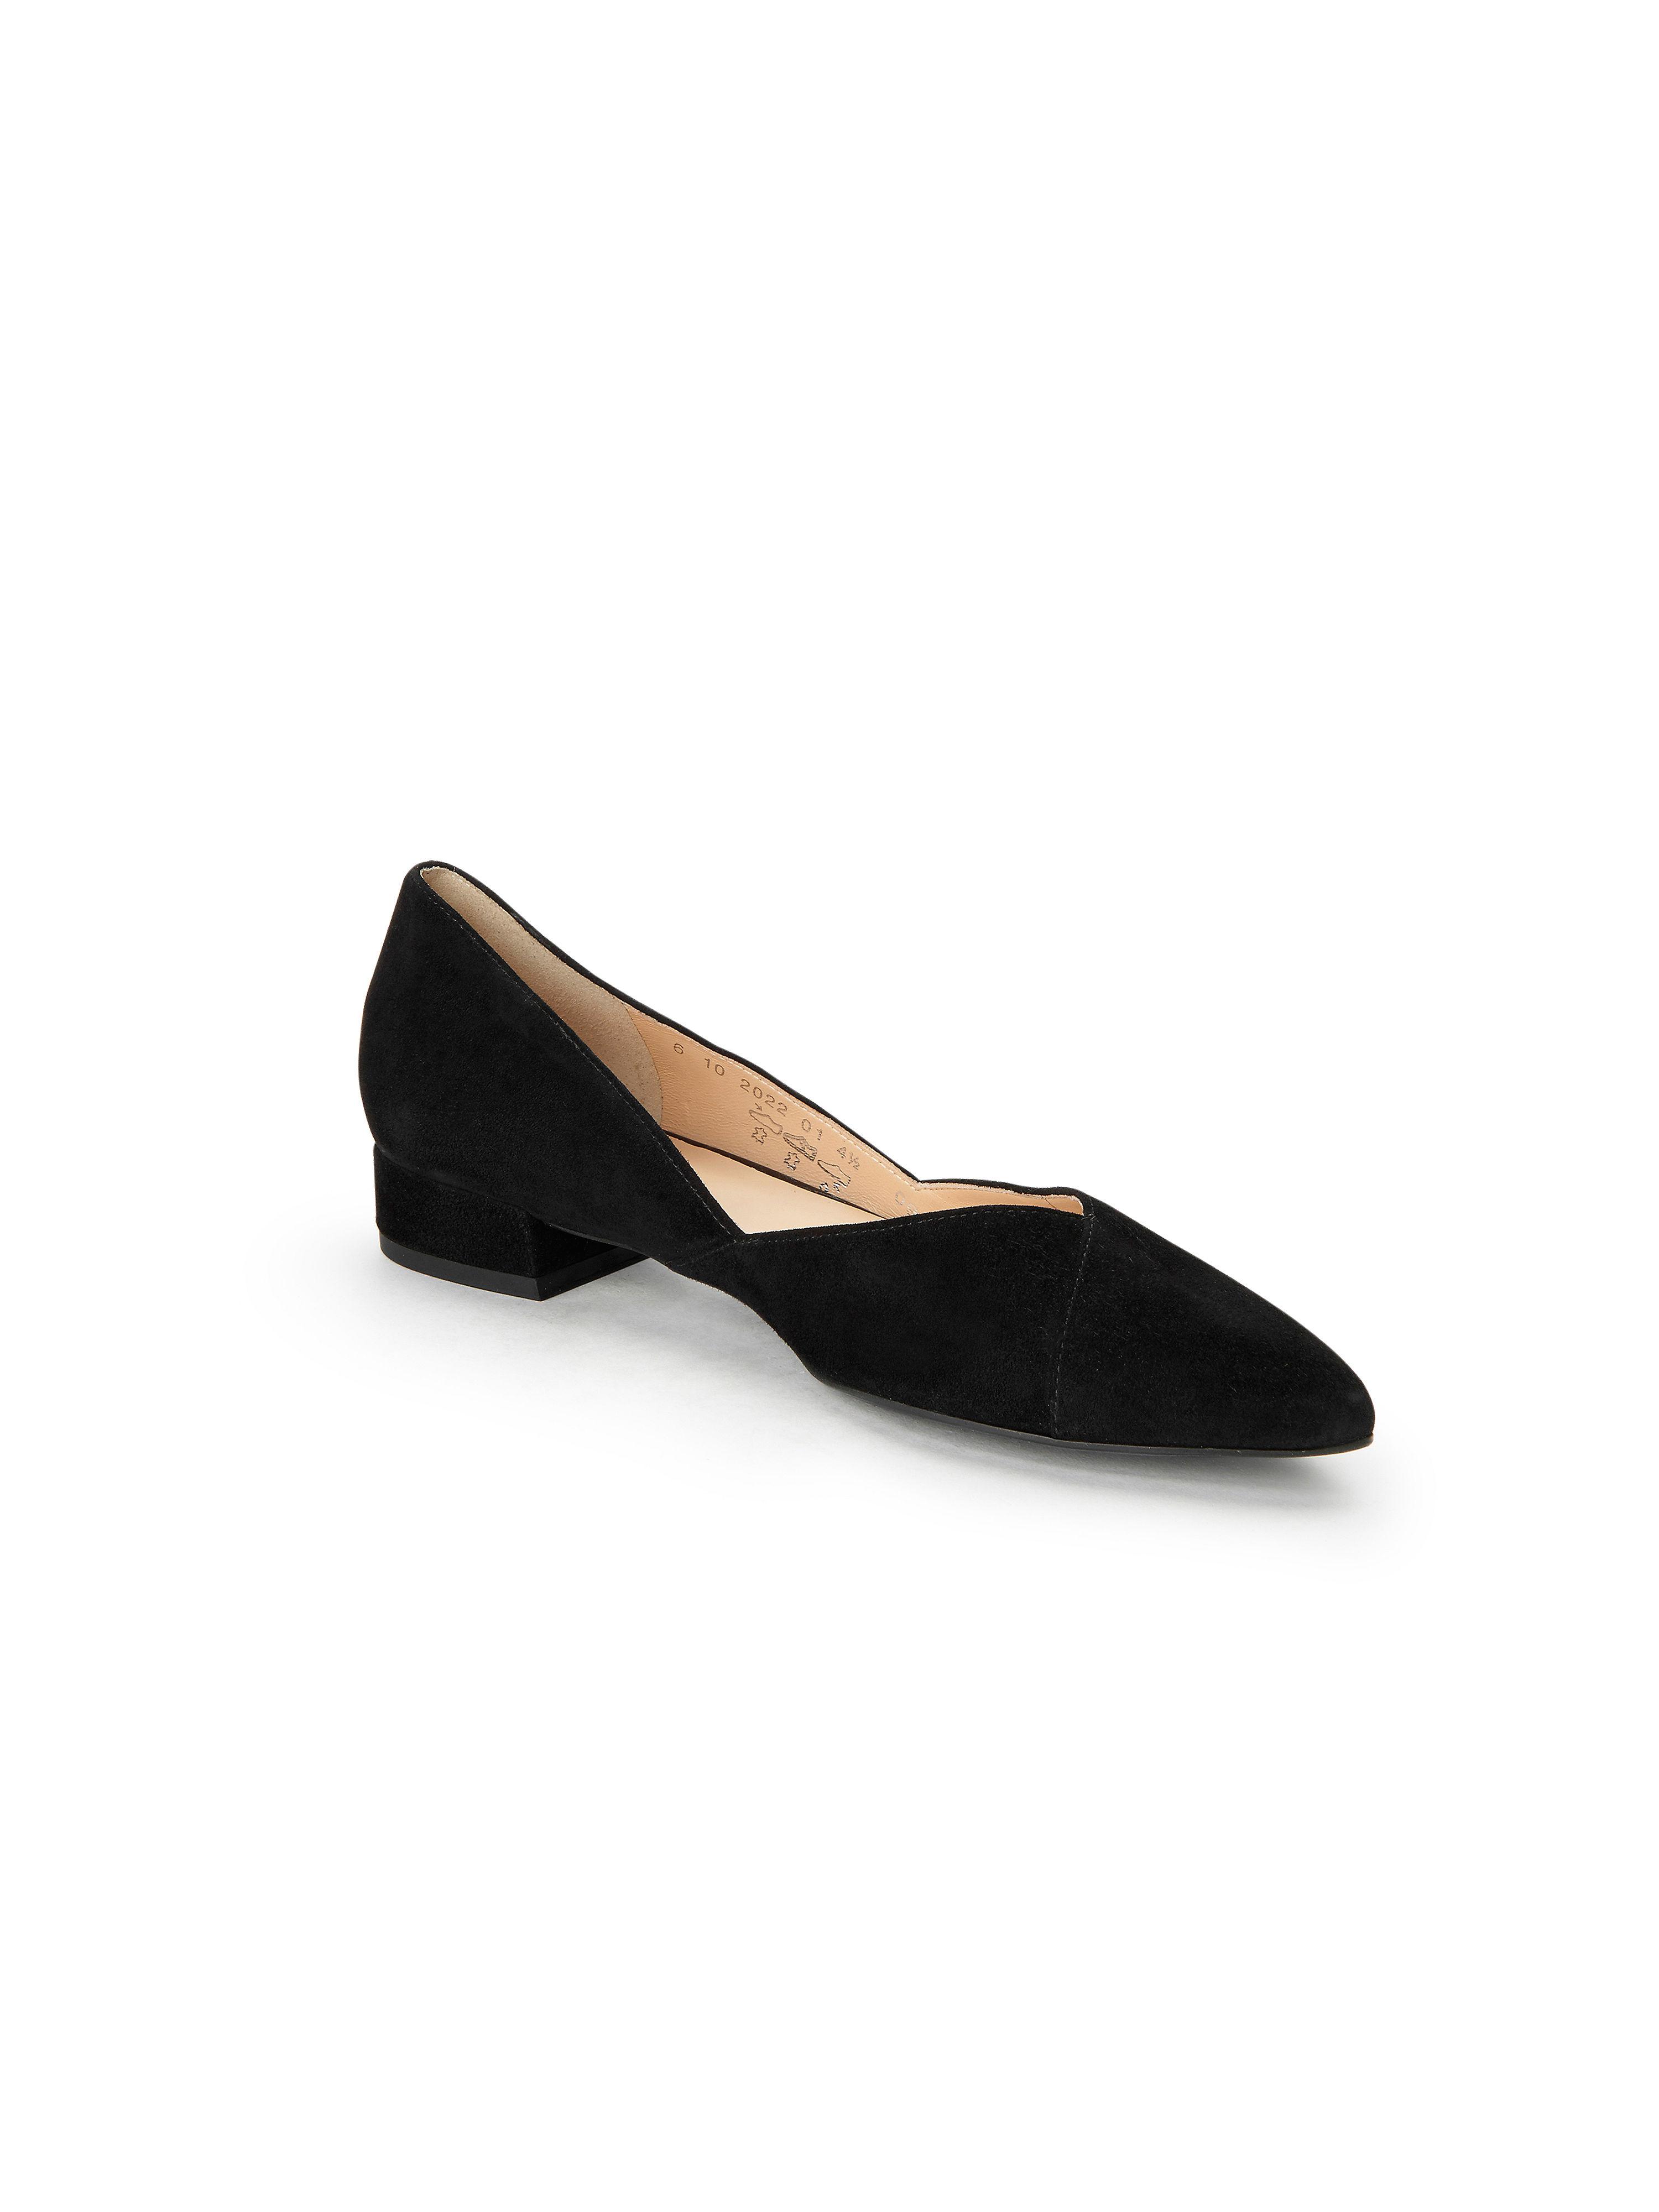 Högl - Ballerina aus 100% Leder - Schwarz Gute Qualität beliebte Schuhe